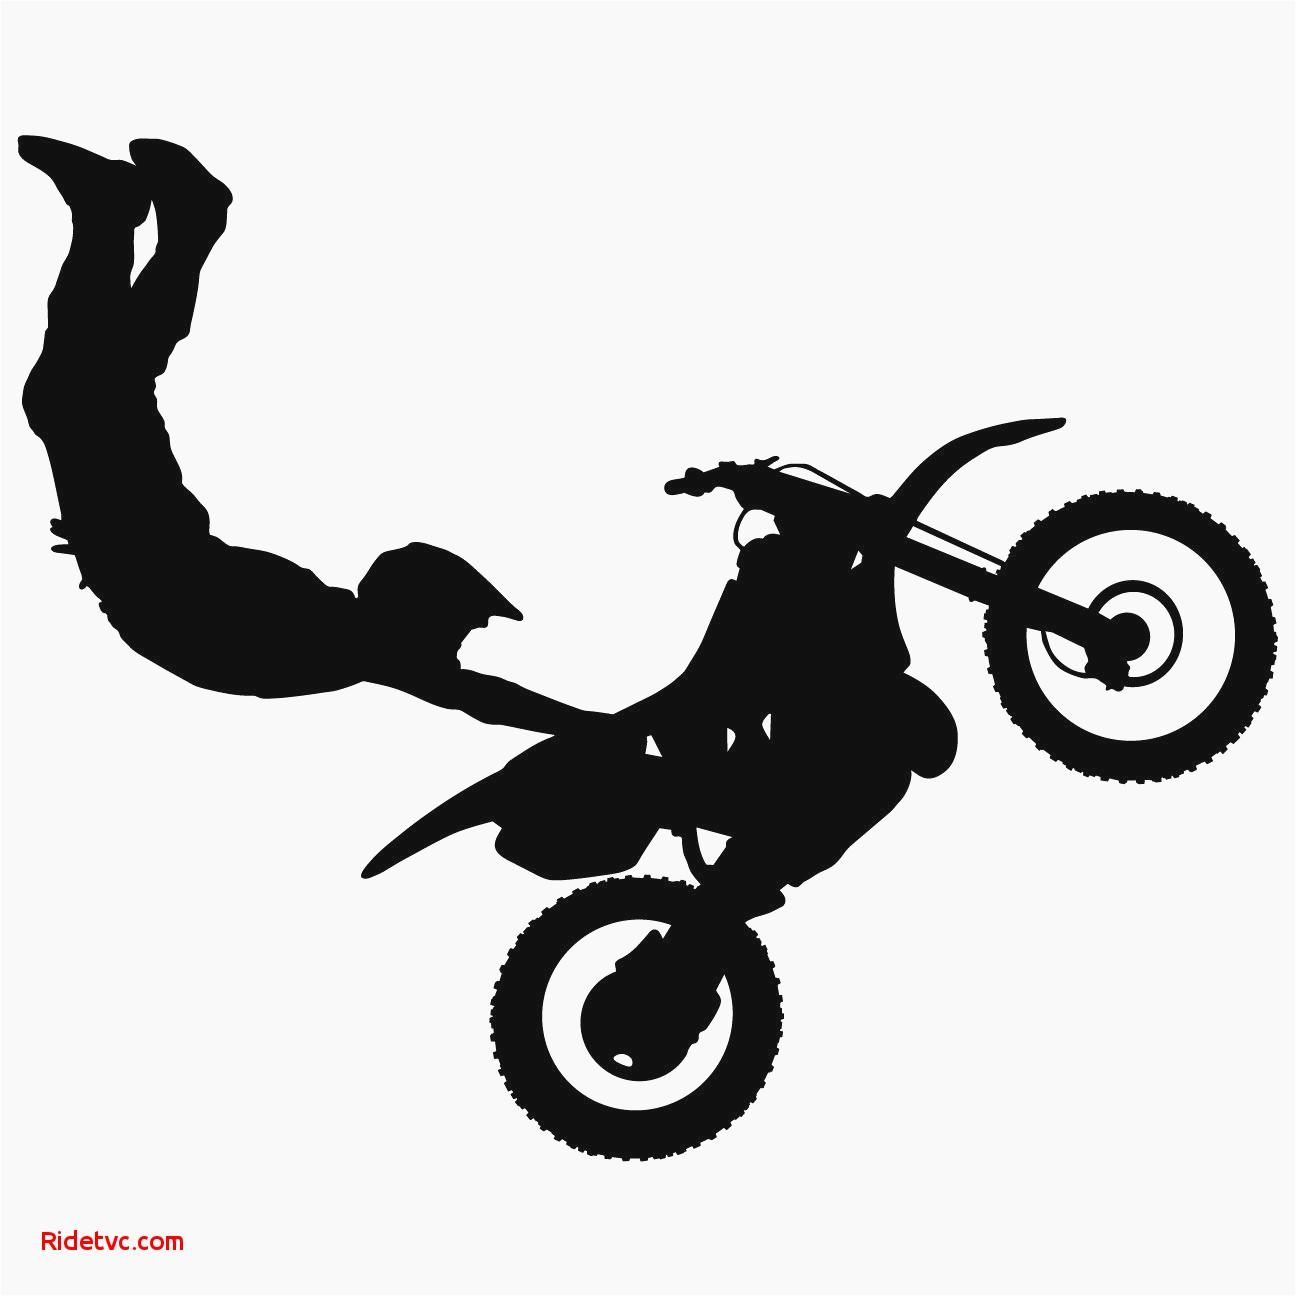 1296x1296 Dirt Bike Vector Graphics Unique Motocross Dirt Bike Wall Decal